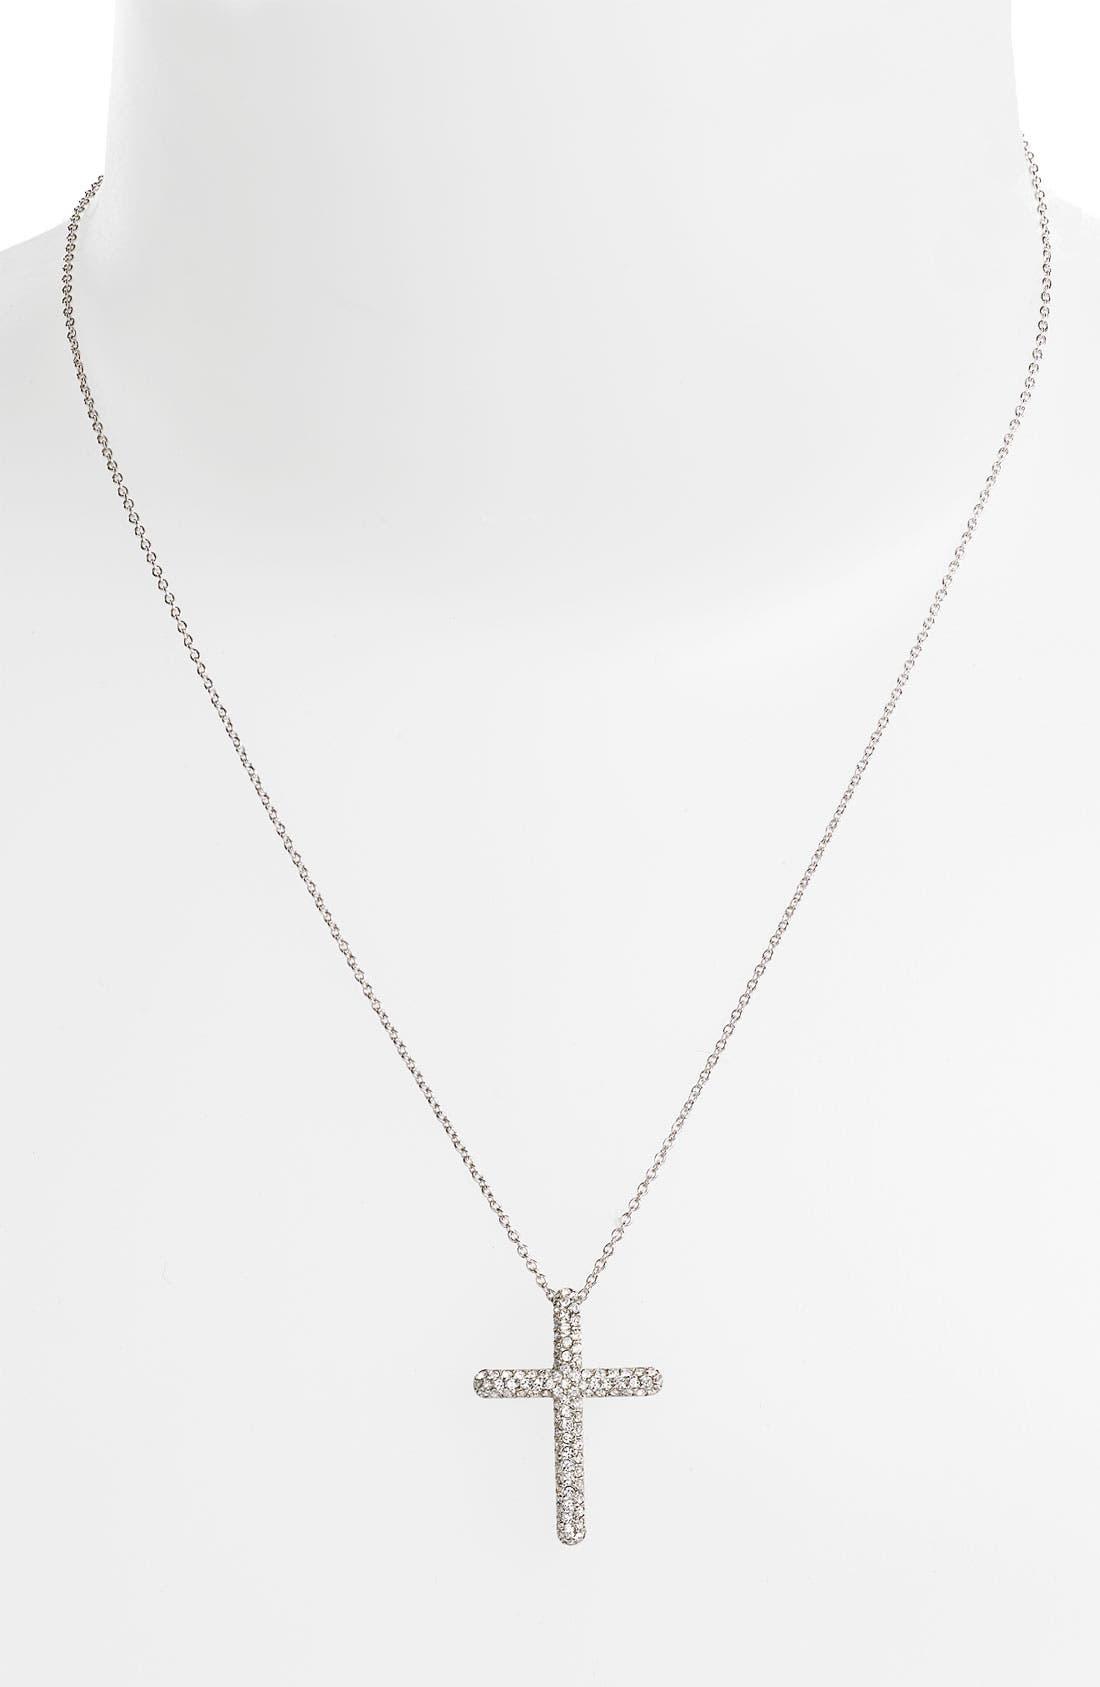 Main Image - Nadri Small Cross Pendant Necklace (Nordstrom Exclusive)